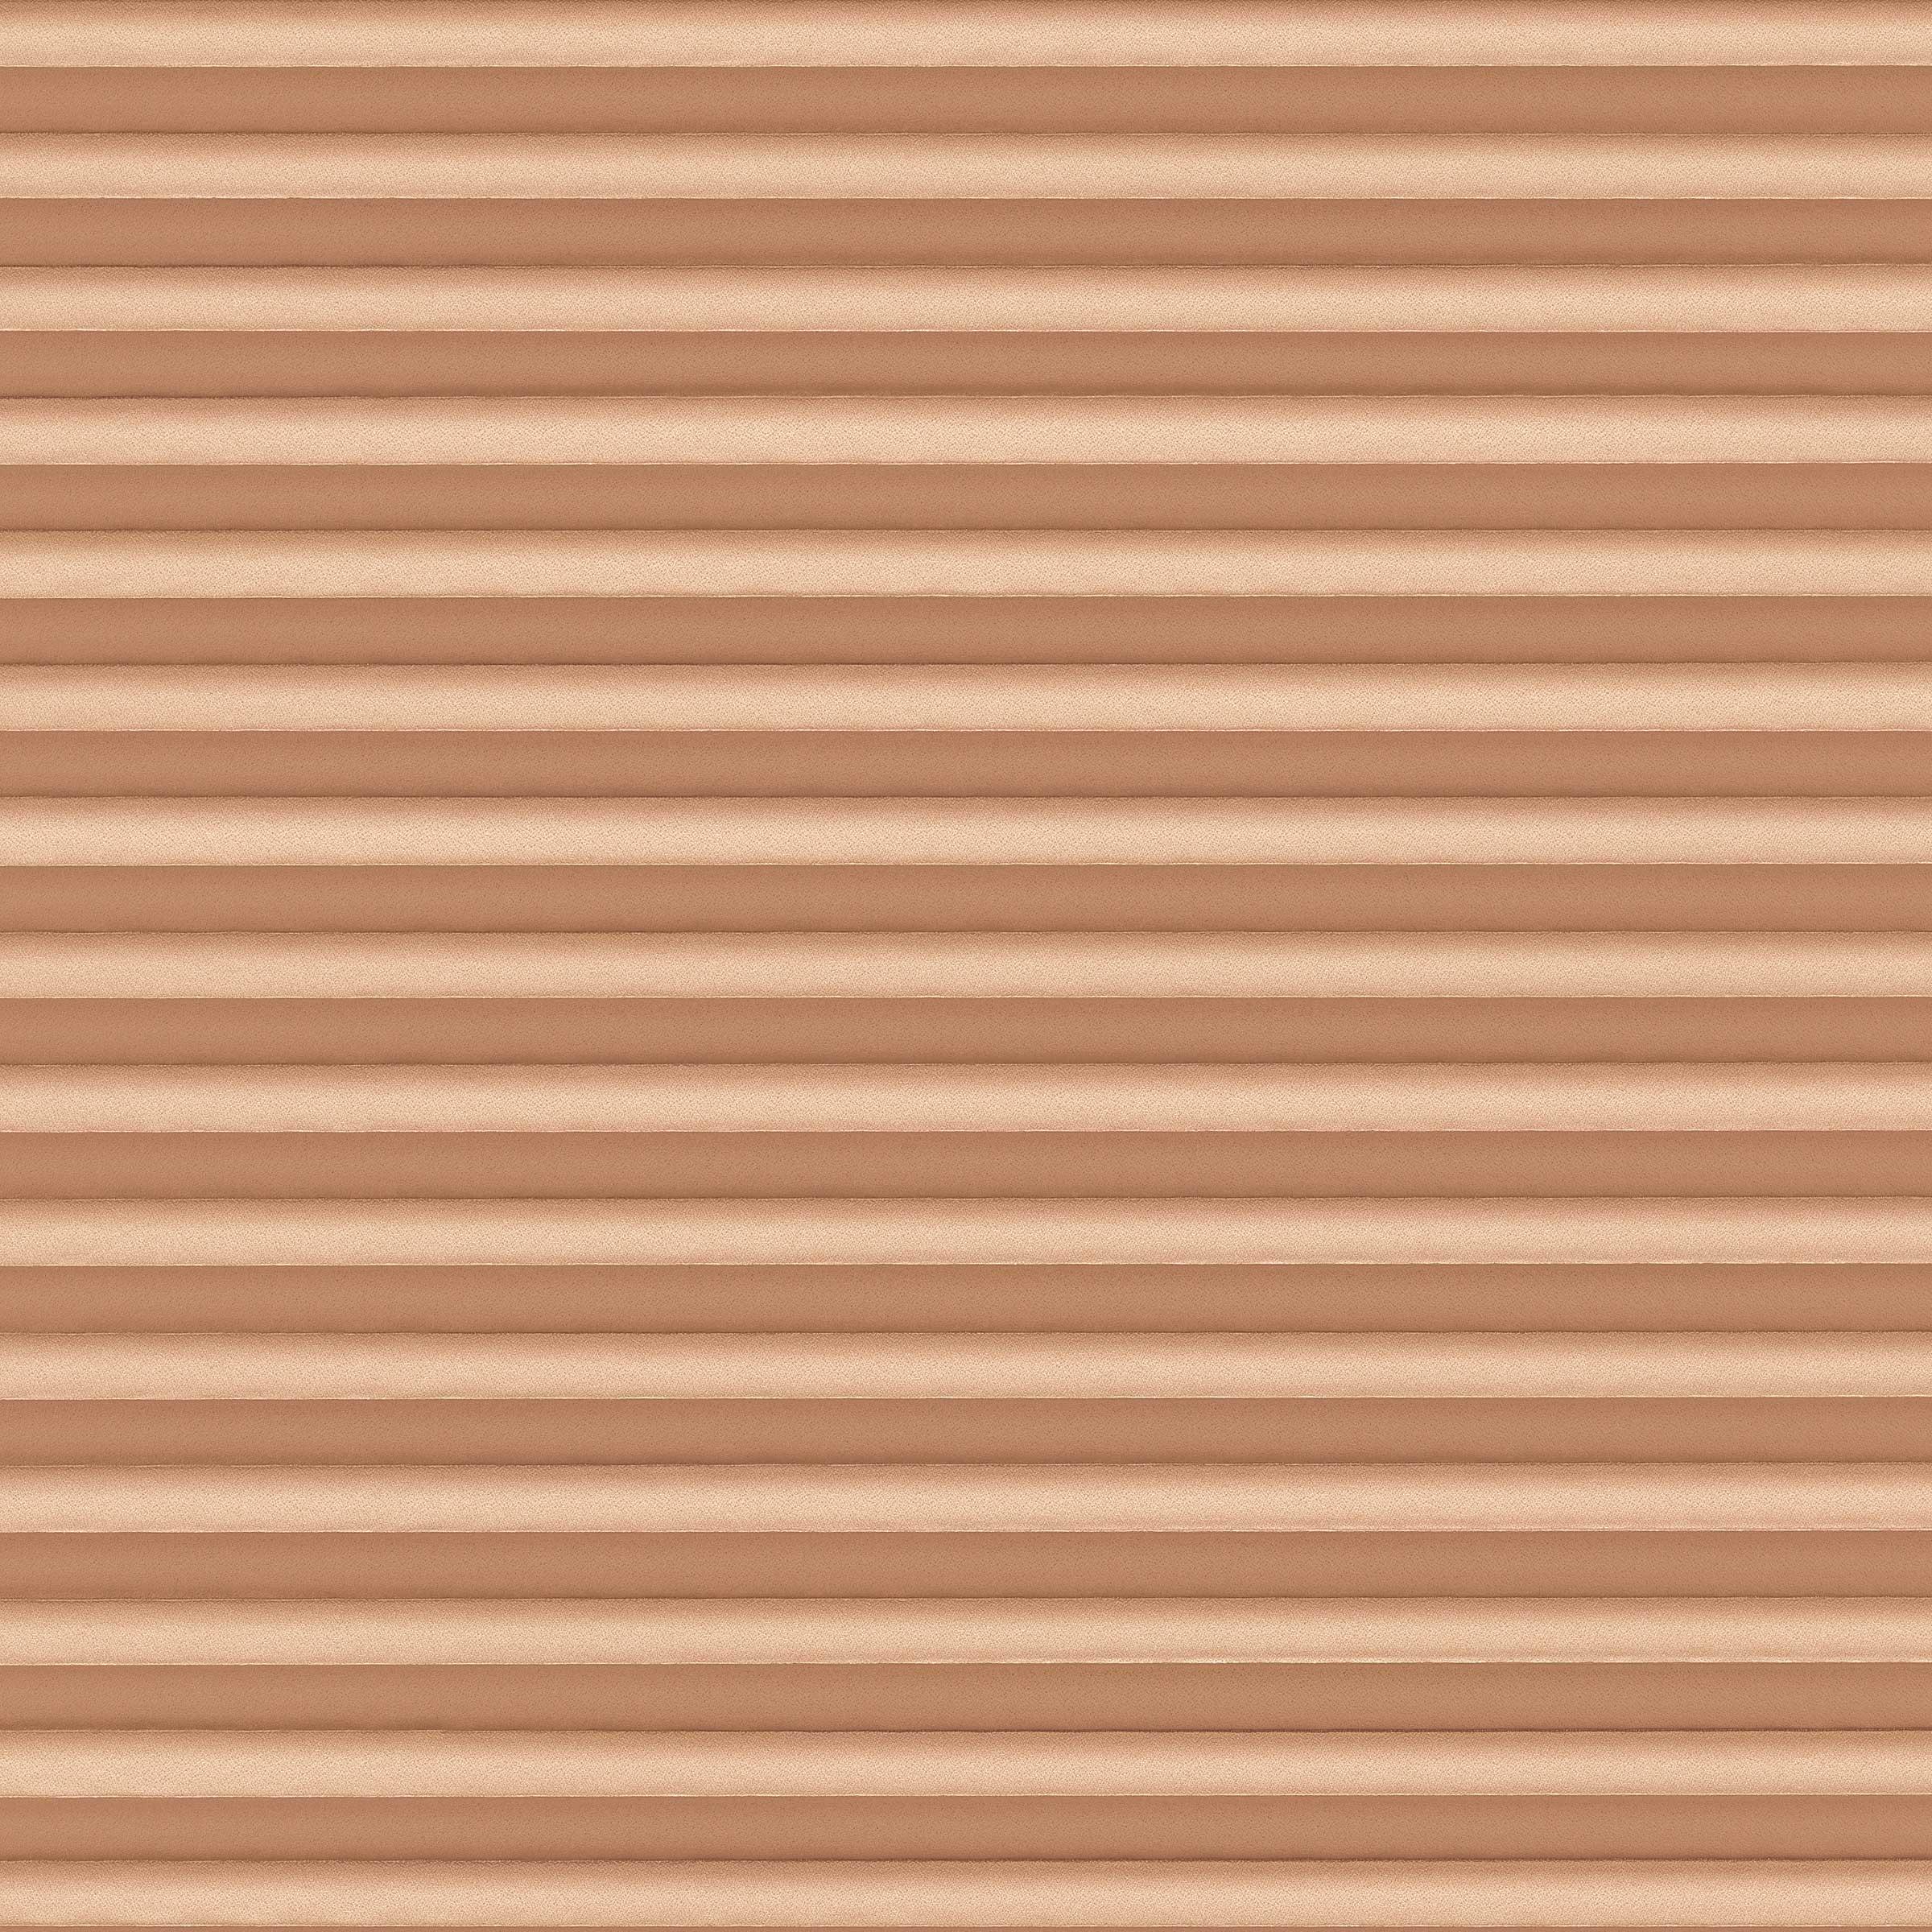 https://www.sunprotection.de/media/image/c7/96/4c/2007_Interieur-Lux_2354_copper_FS_plissee_vanClewe.jpg